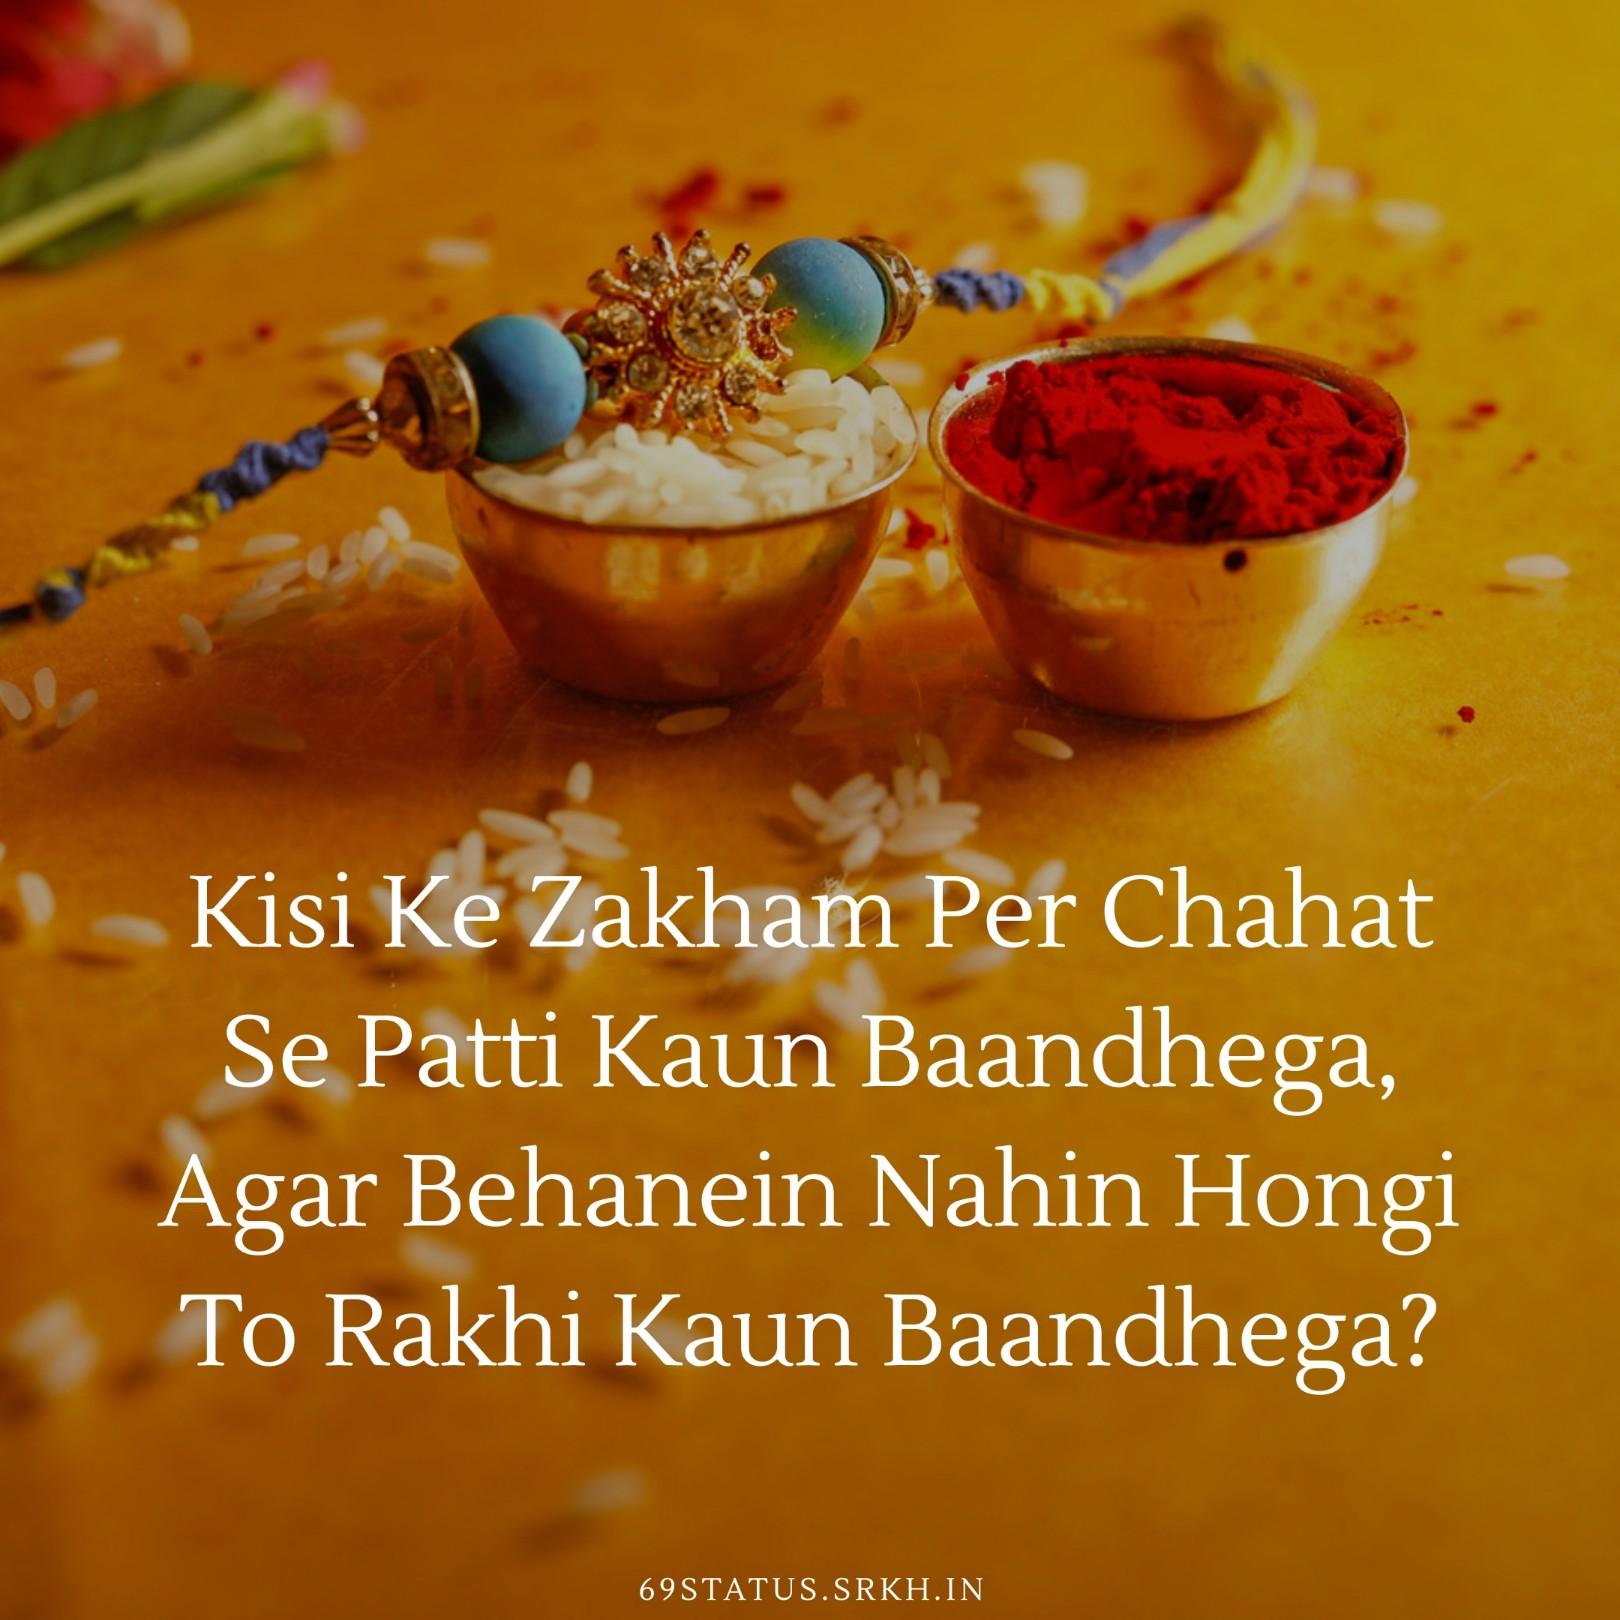 Raksha Bandhan Shayari Images full HD free download.